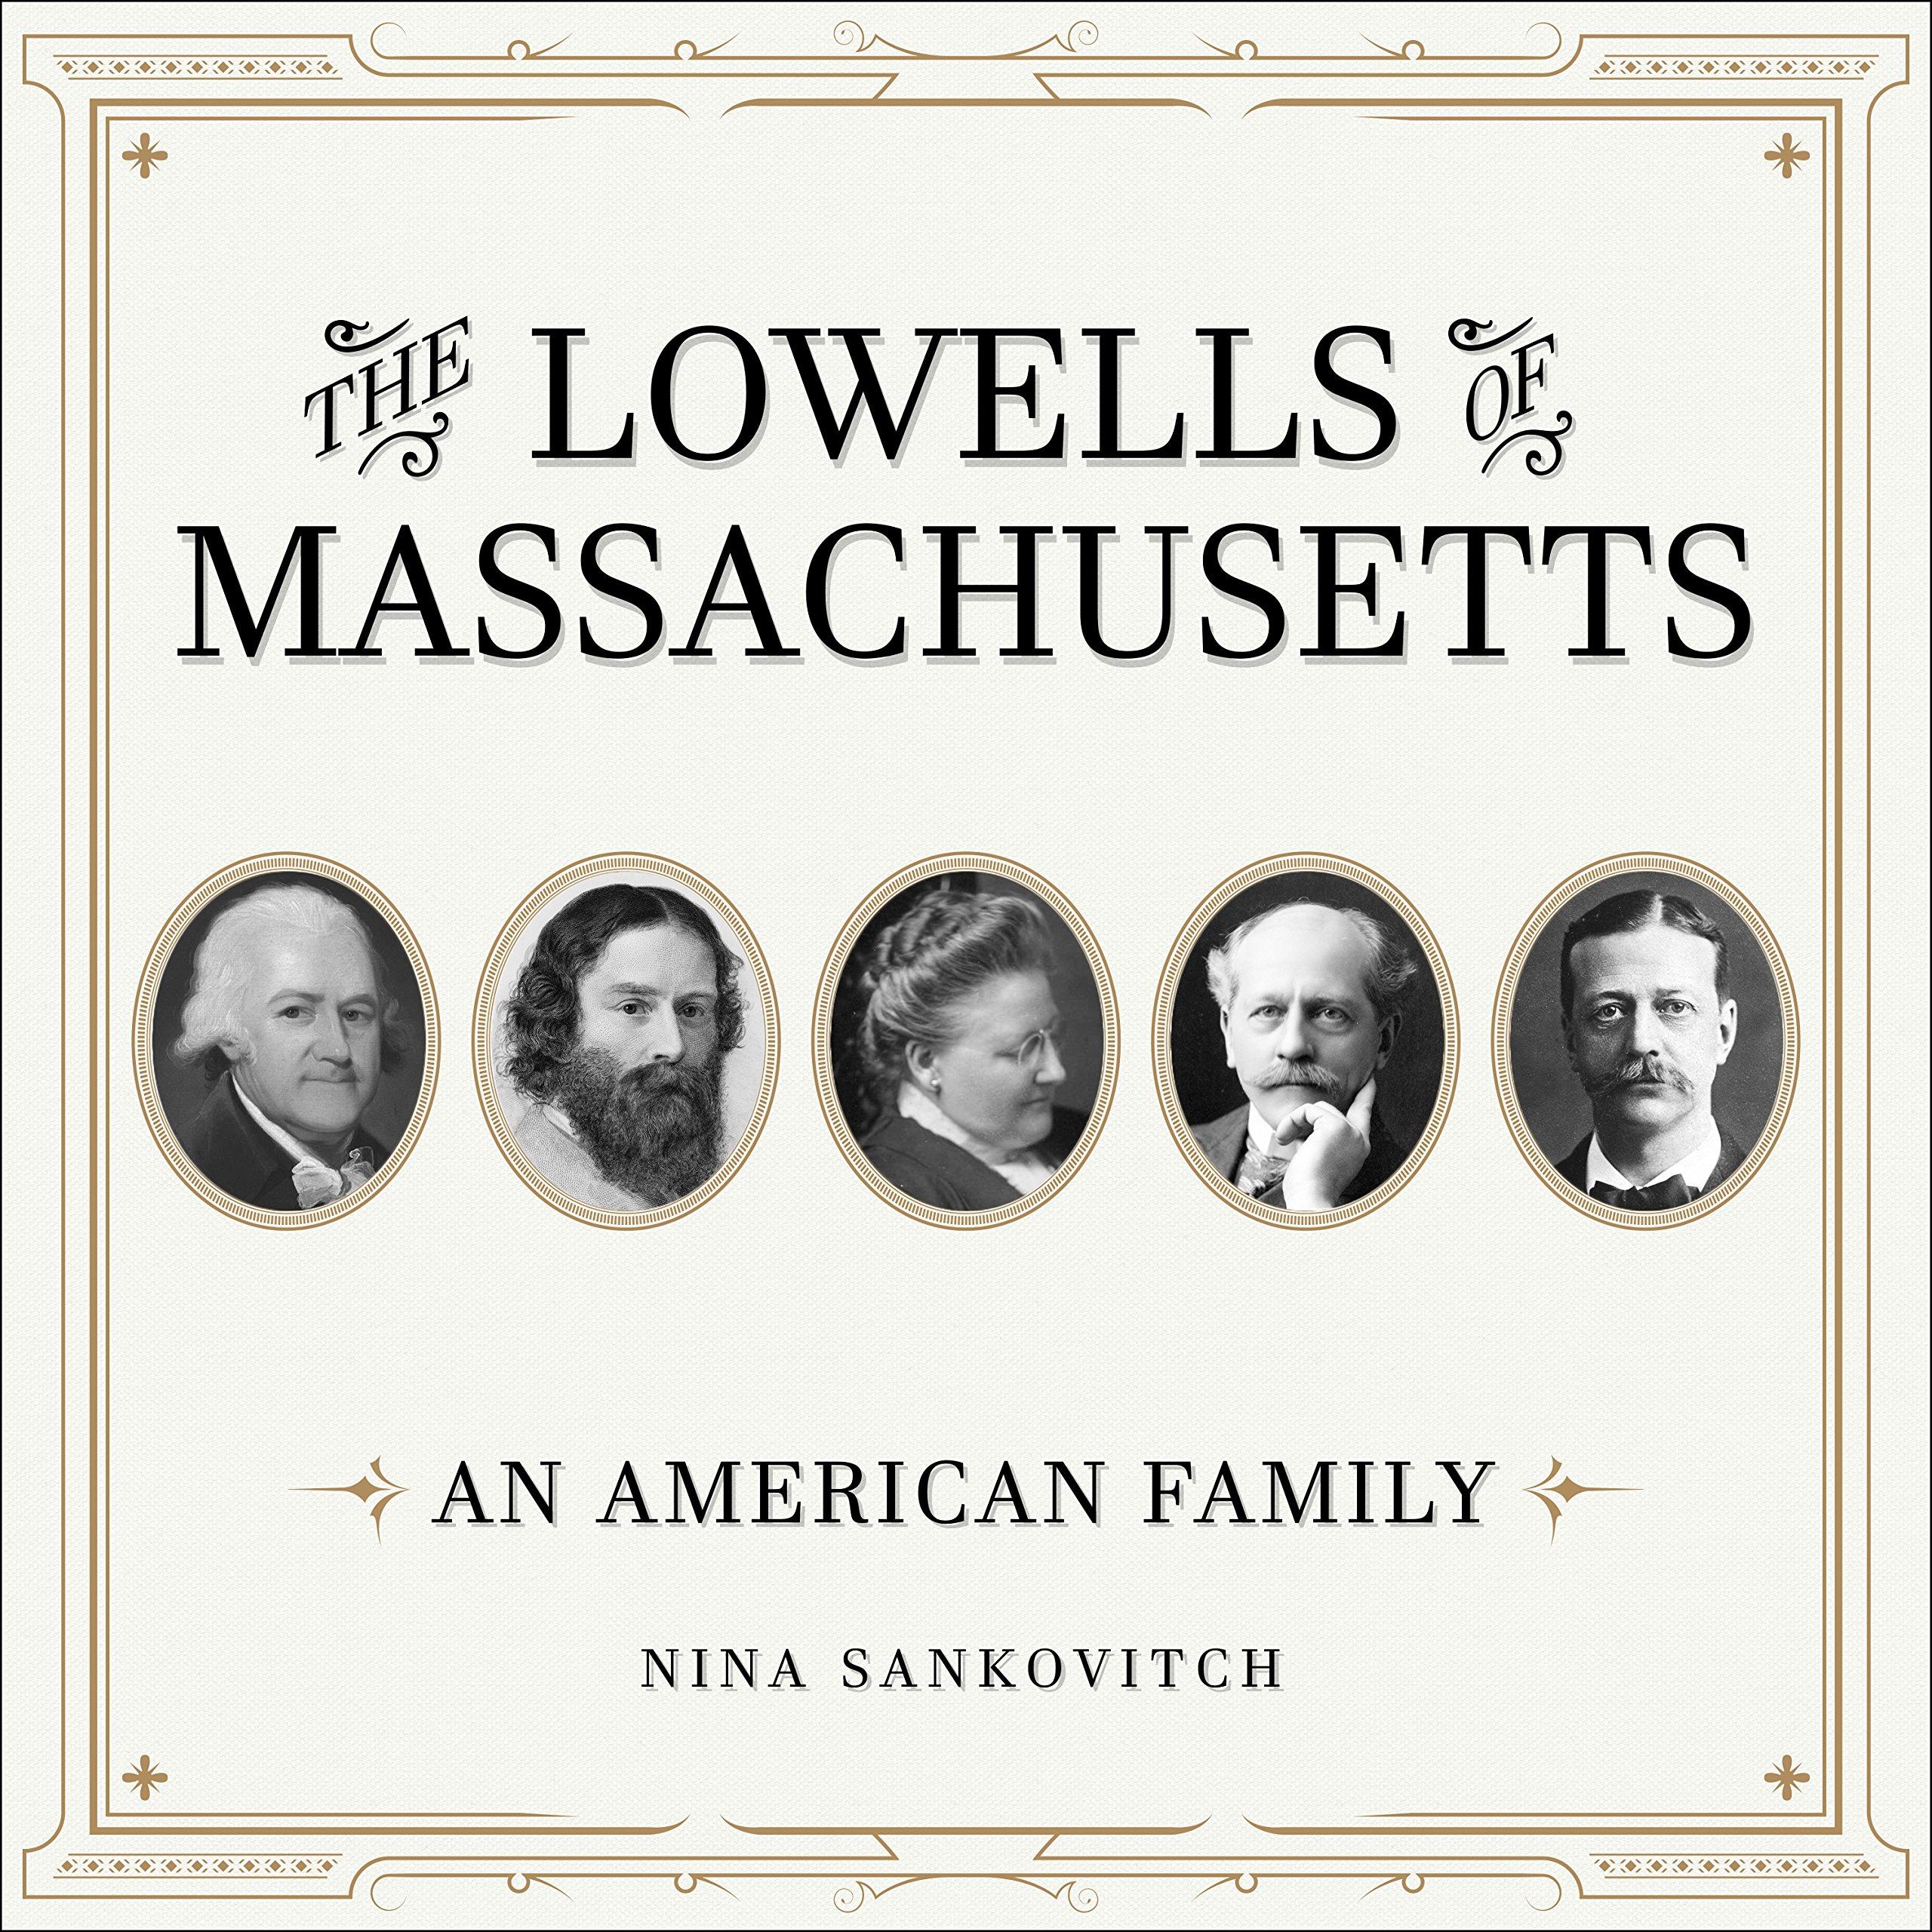 The Lowells of Massachusetts: An American Family